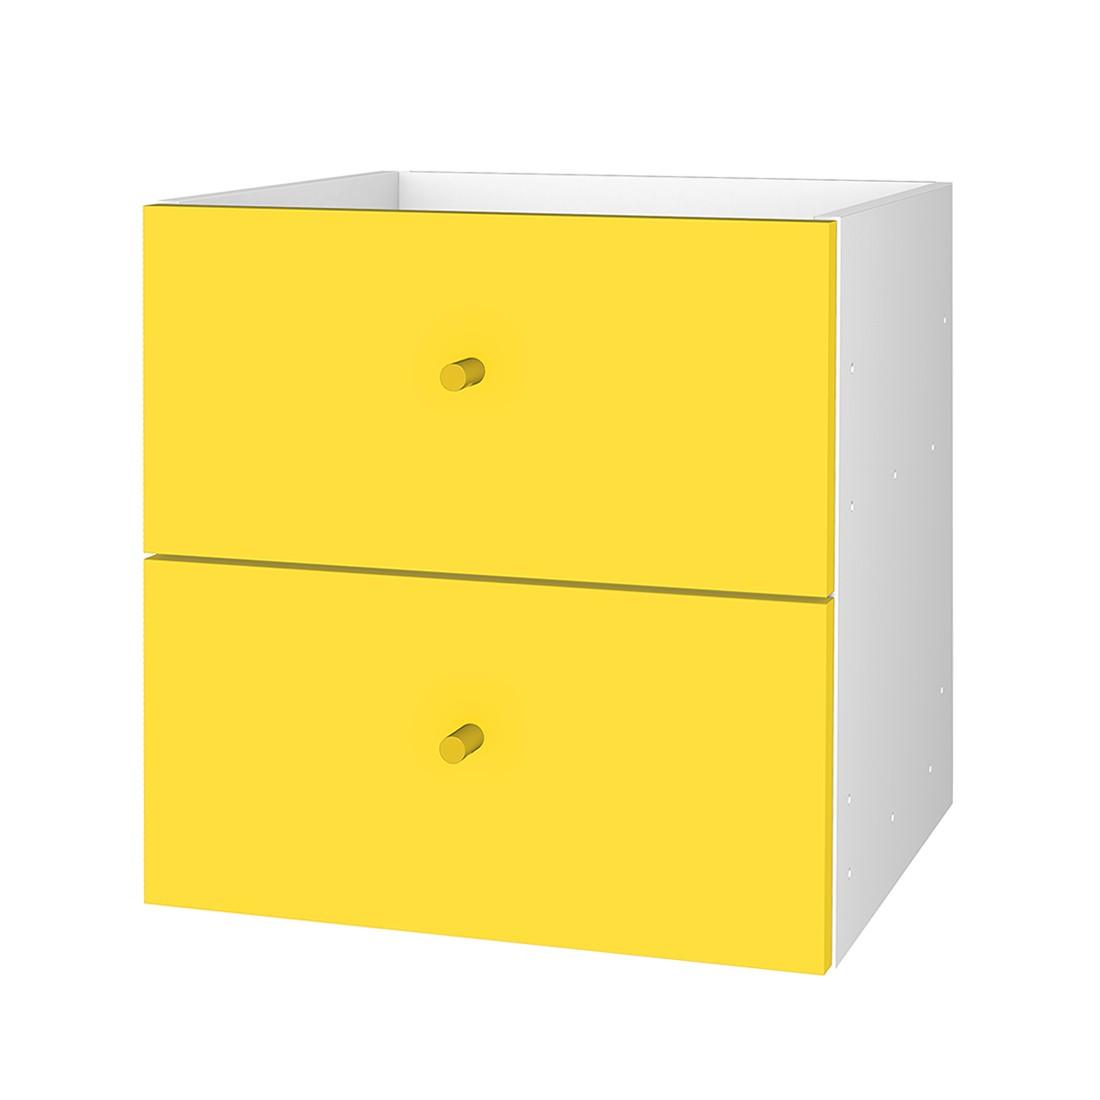 schubkastenelement box gelb tenzo m tz 1114 0045. Black Bedroom Furniture Sets. Home Design Ideas